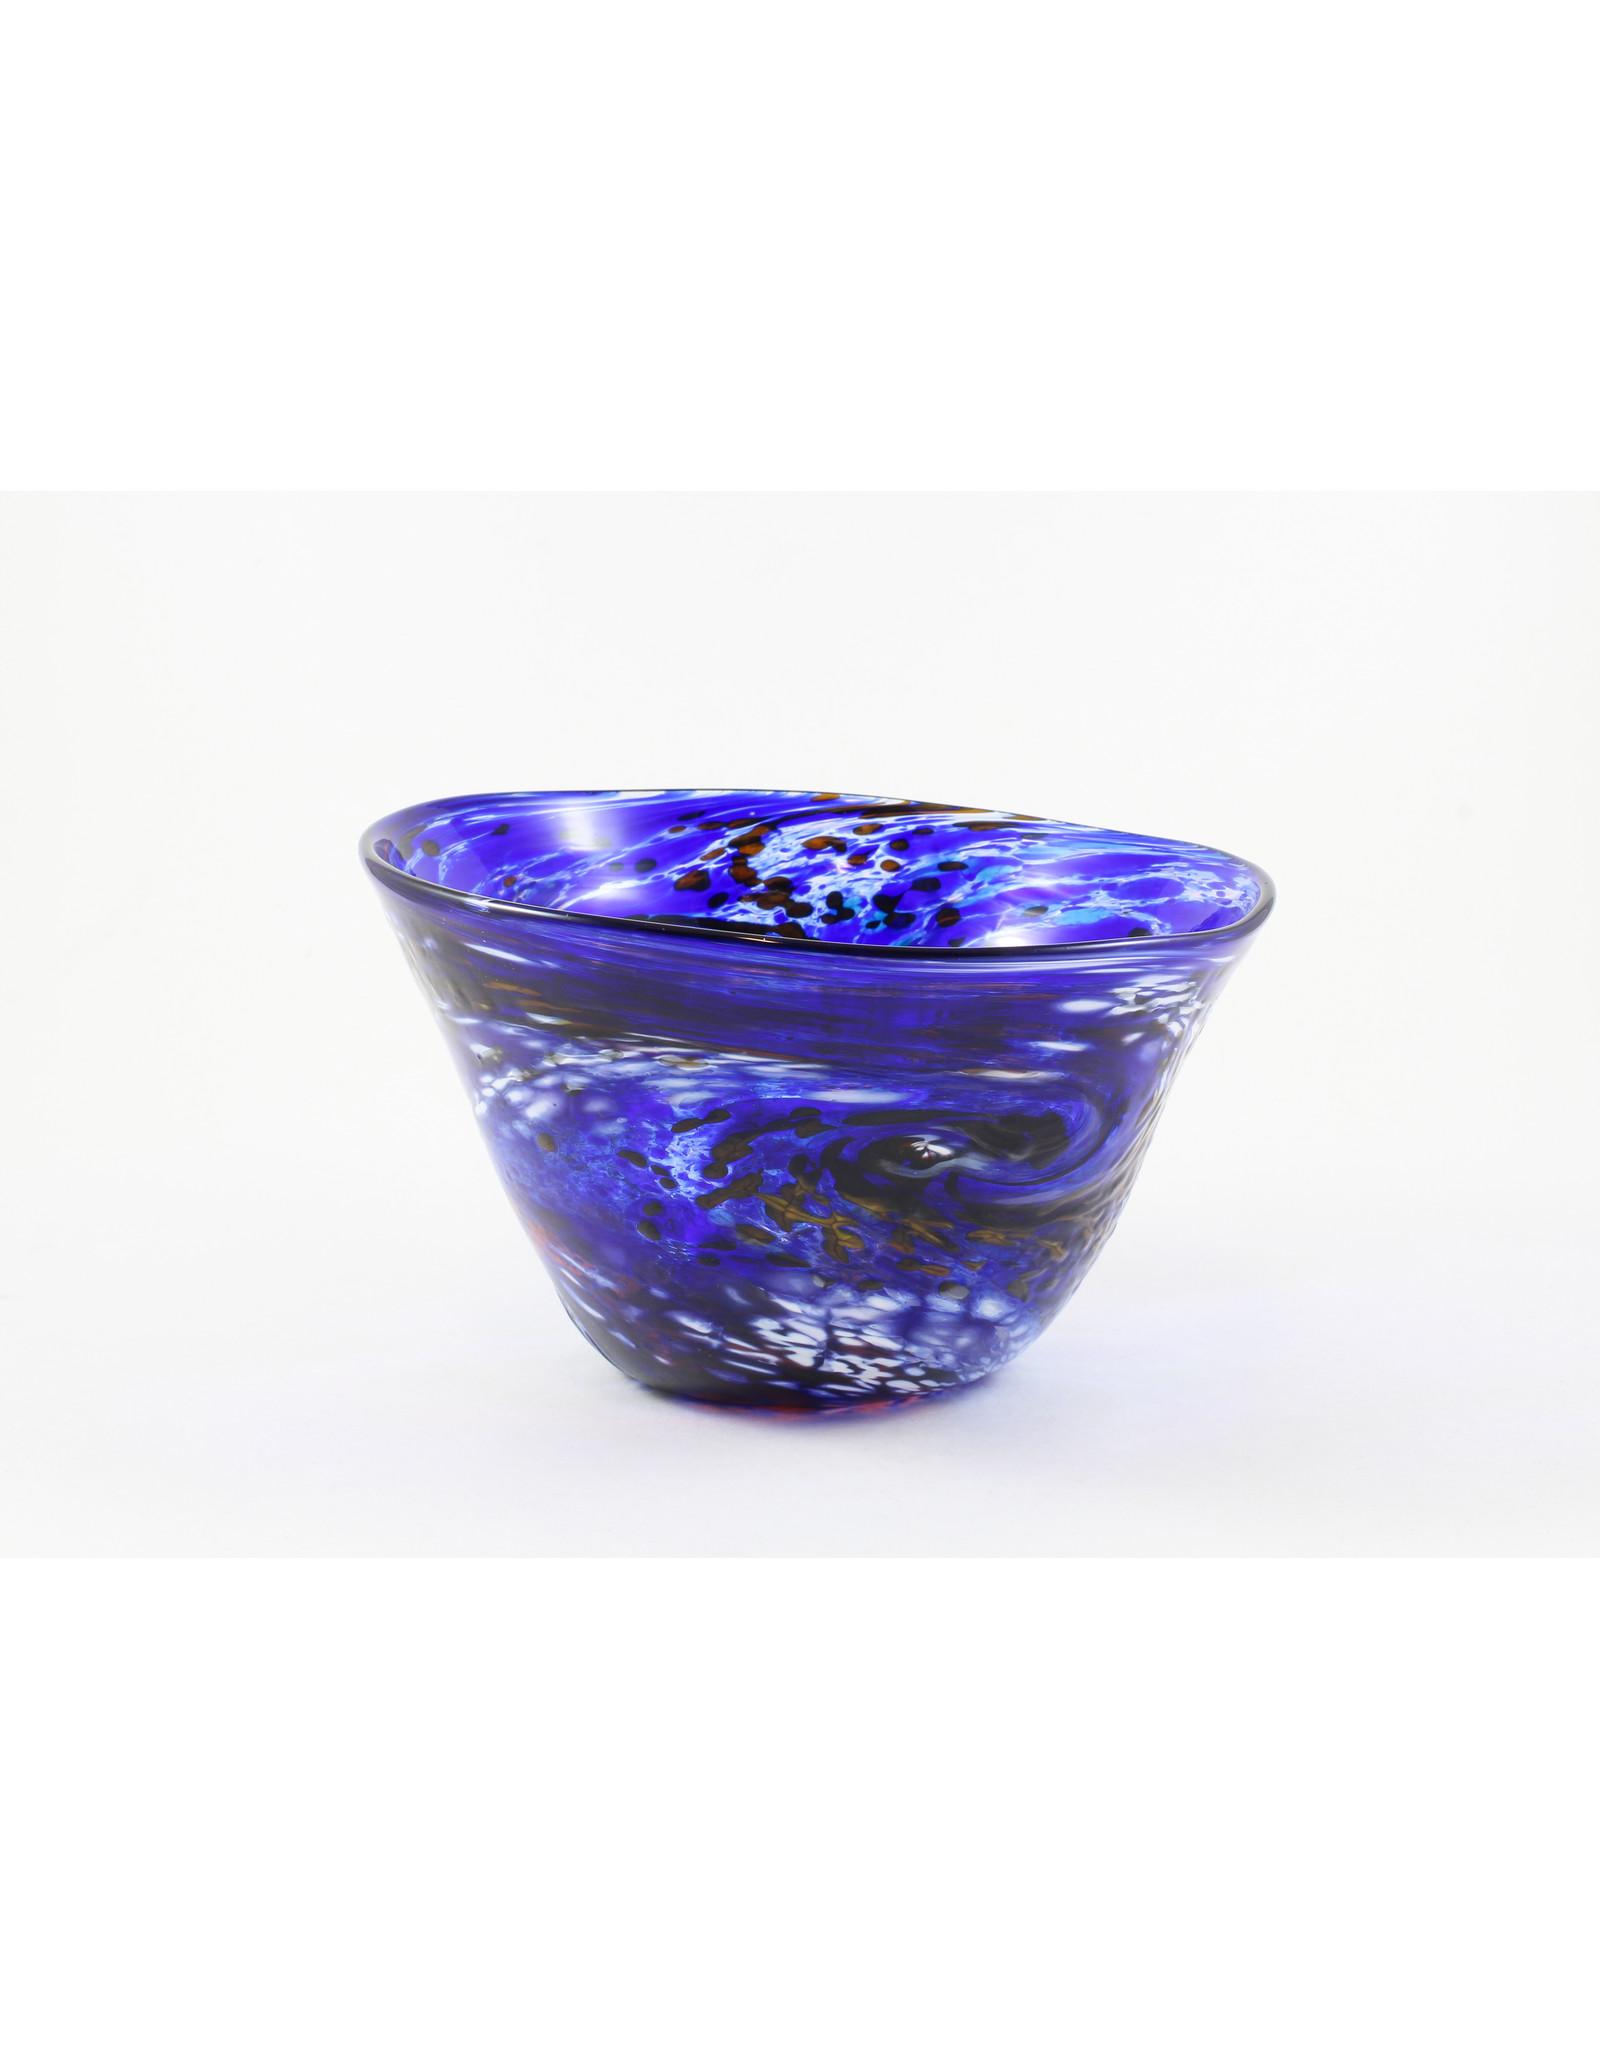 Wendy Smith Medium Blown Glass Bowl by Glass Artisans